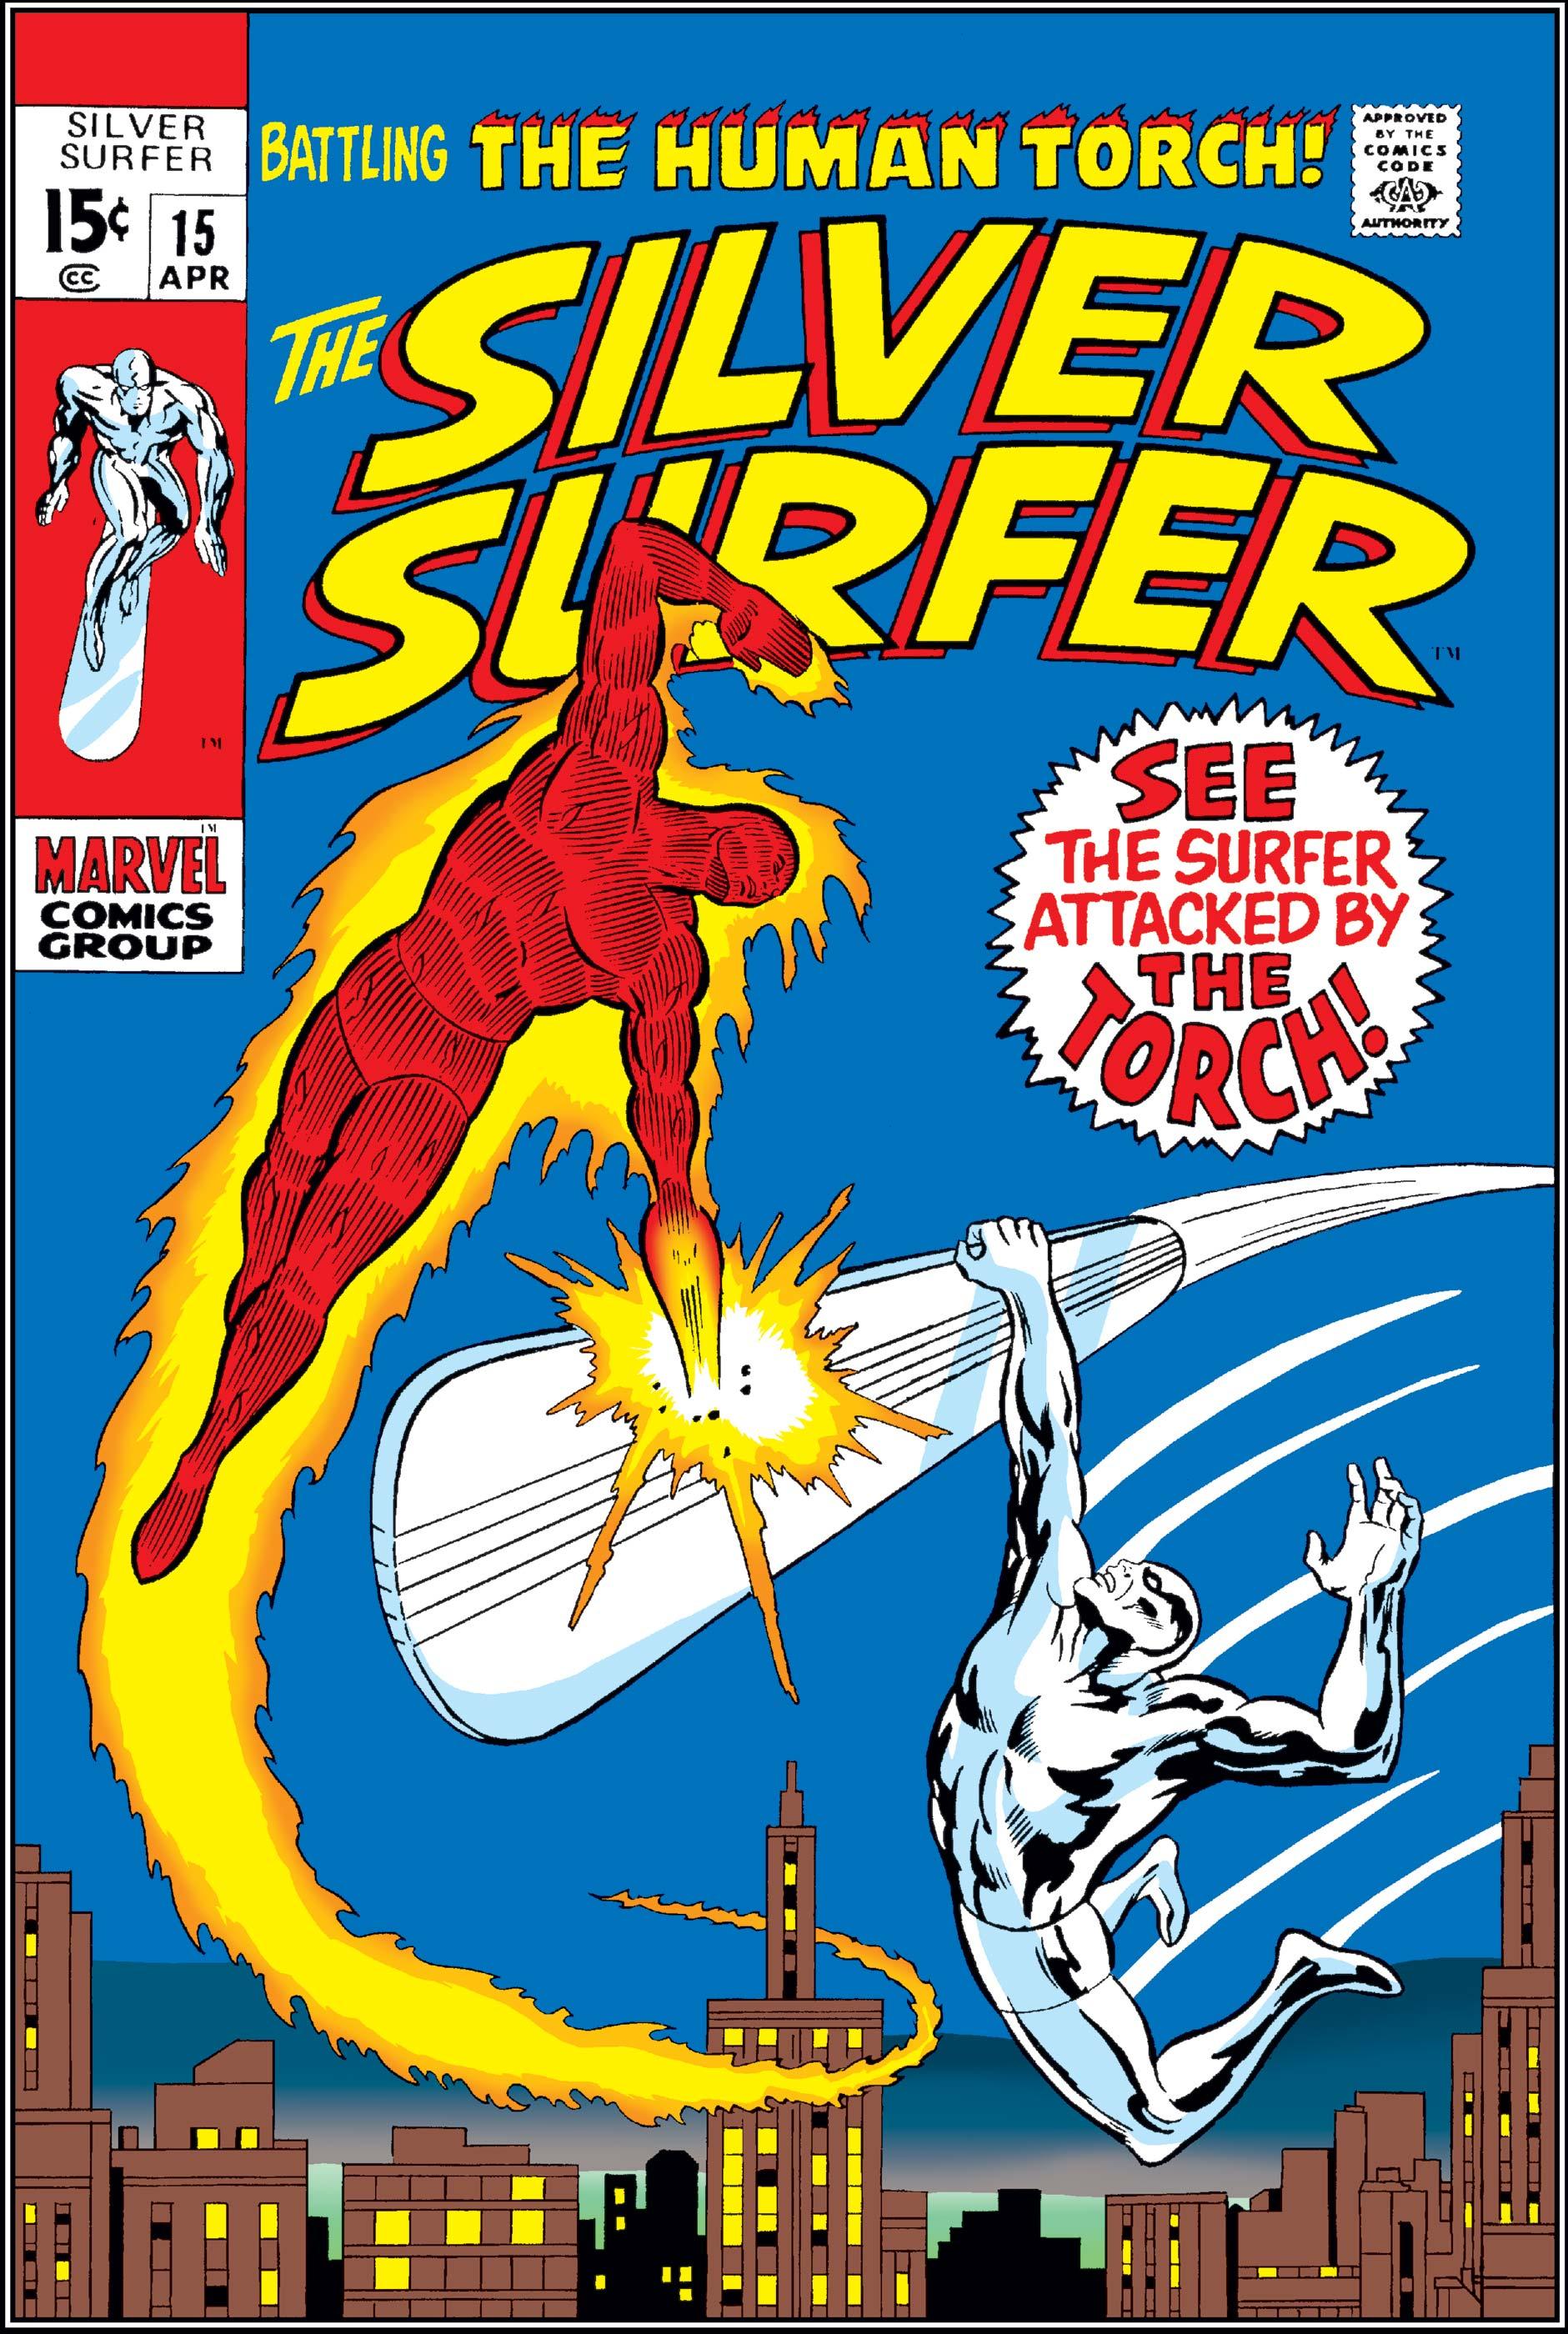 Silver Surfer (1968) #15